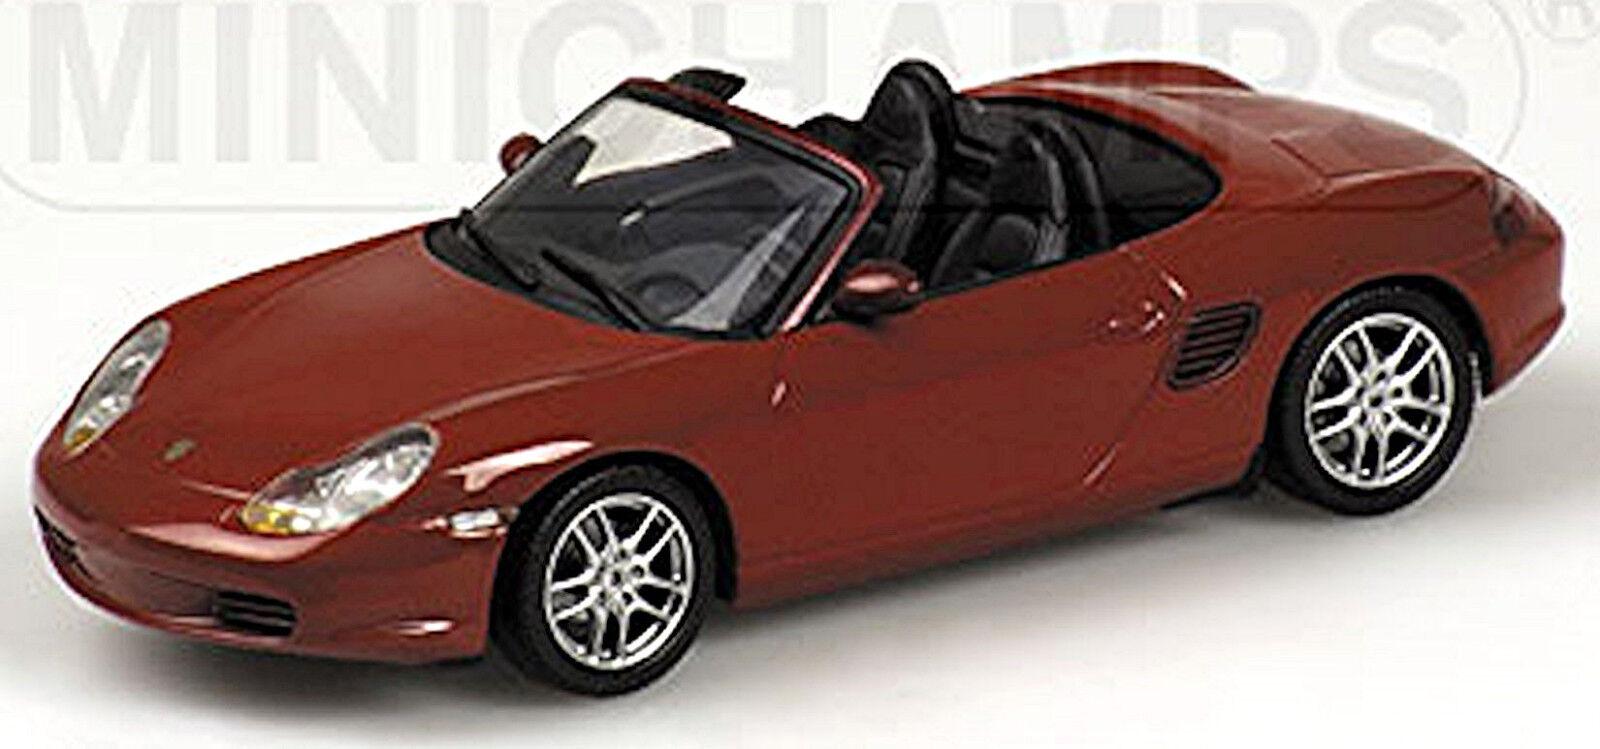 Porsche Boxster Typ  986 1996-2004 orient red red metallic 1 43 Minichamps